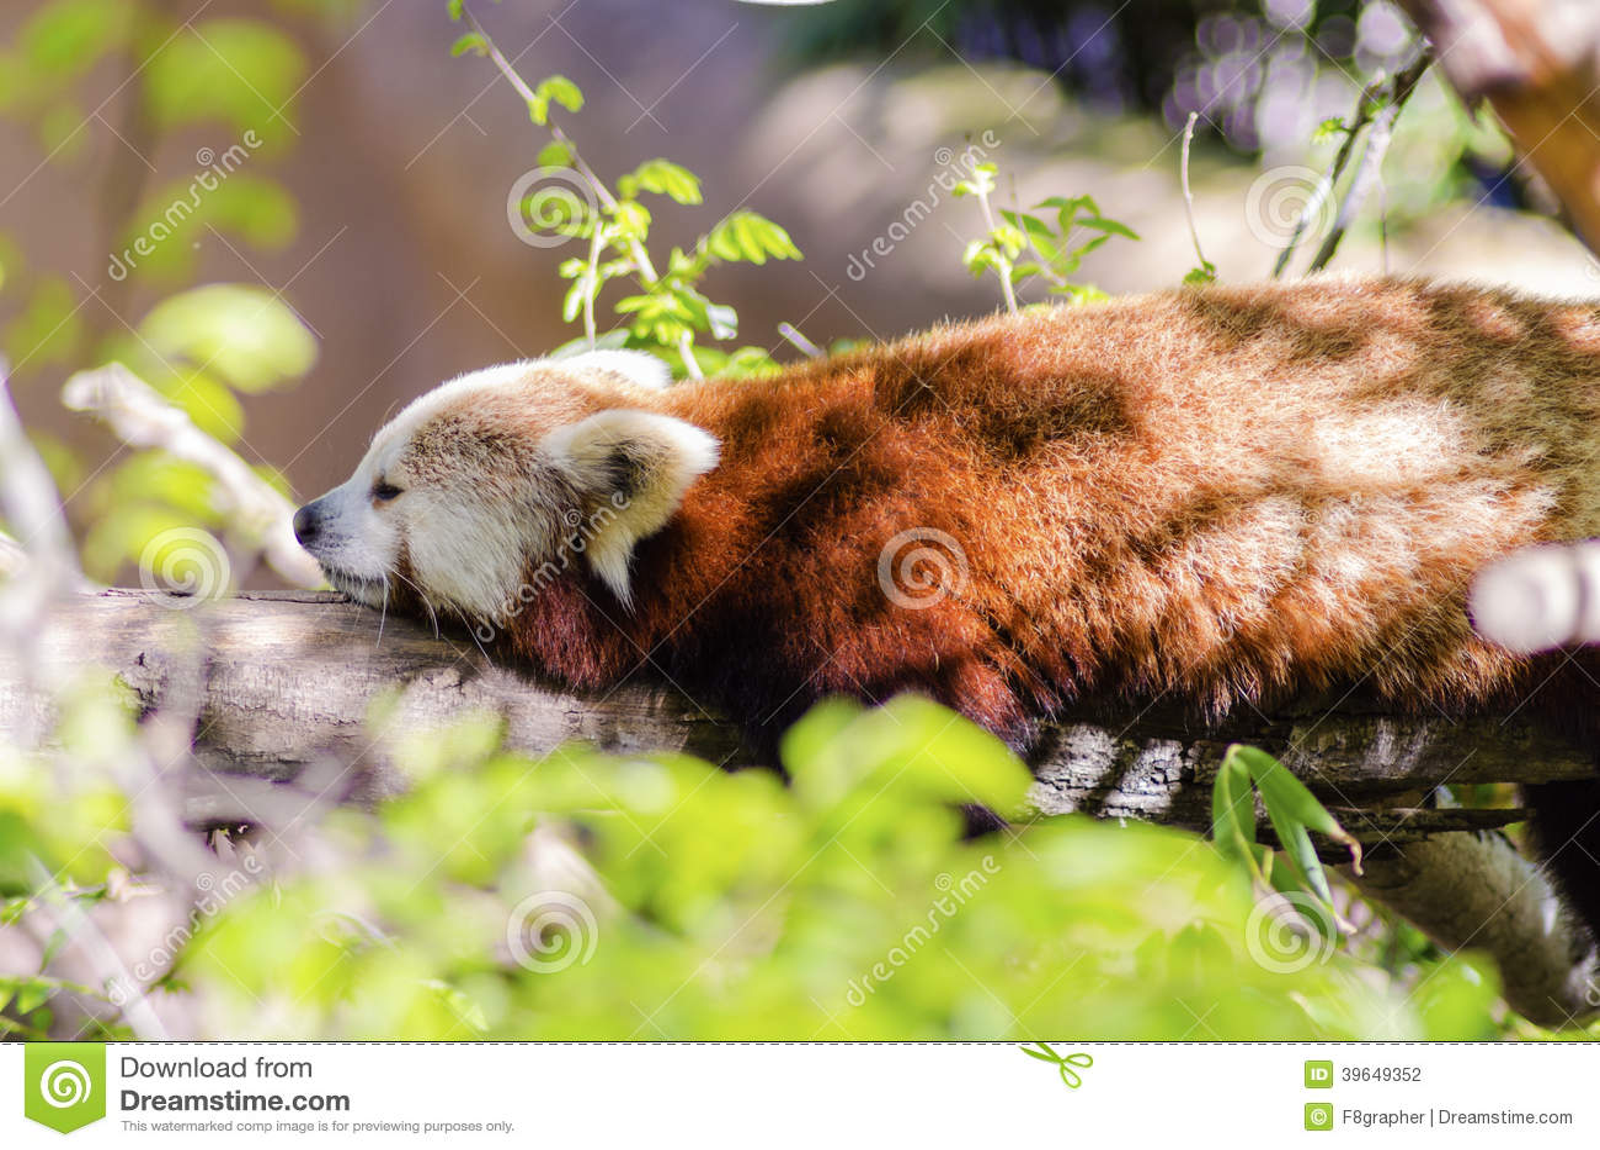 Cat Dangling From Tree Free Cartoon Image